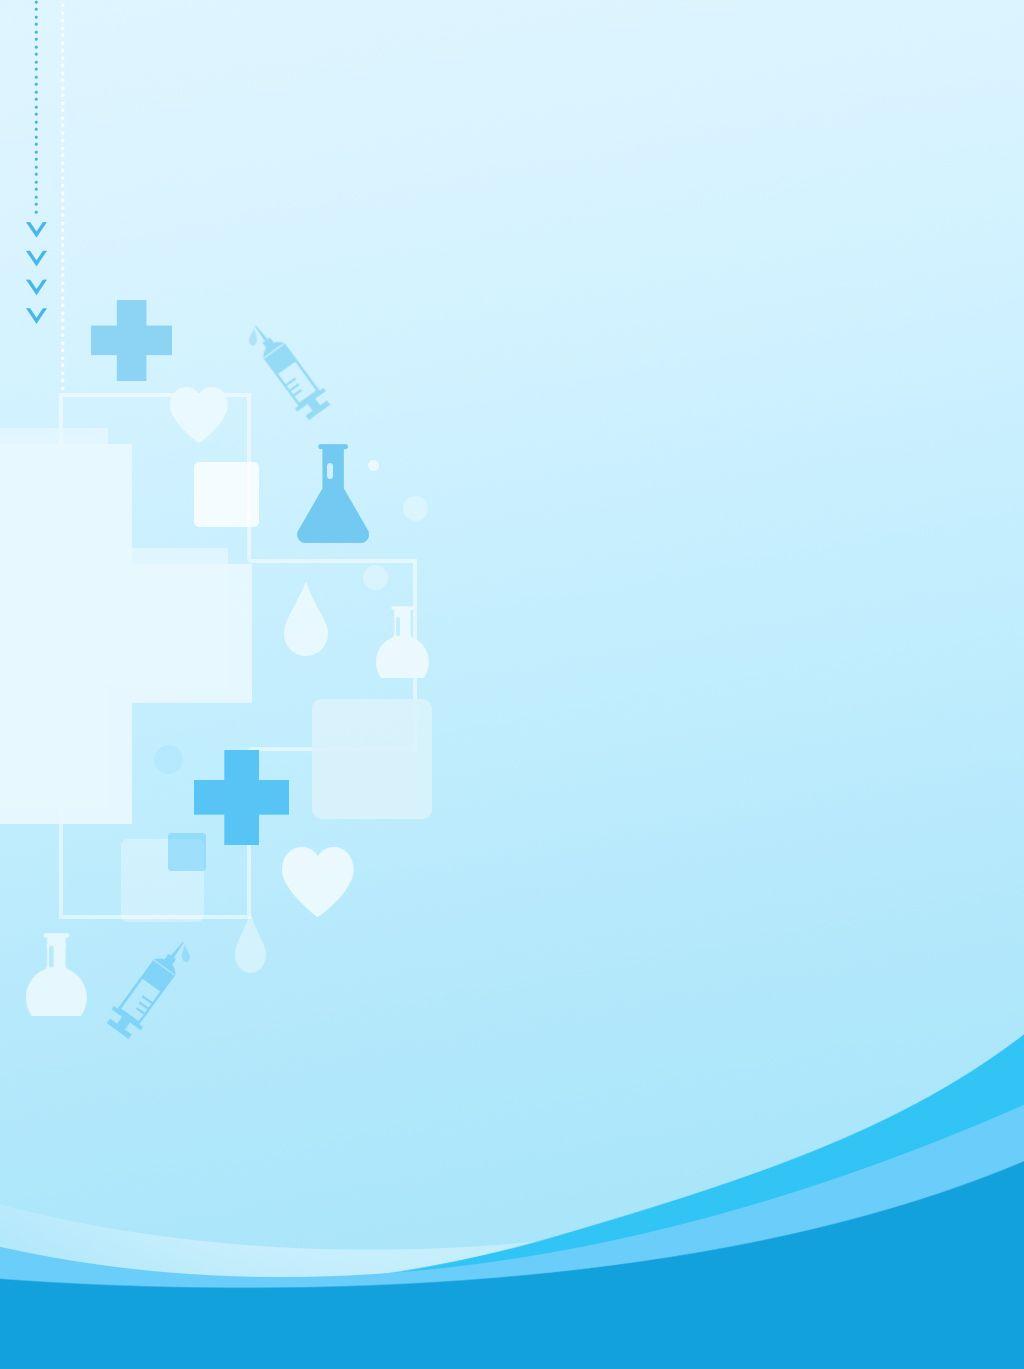 Biomedical Stock Vectors, Royalty Free Biomedical Illustrations |  Depositphotos®